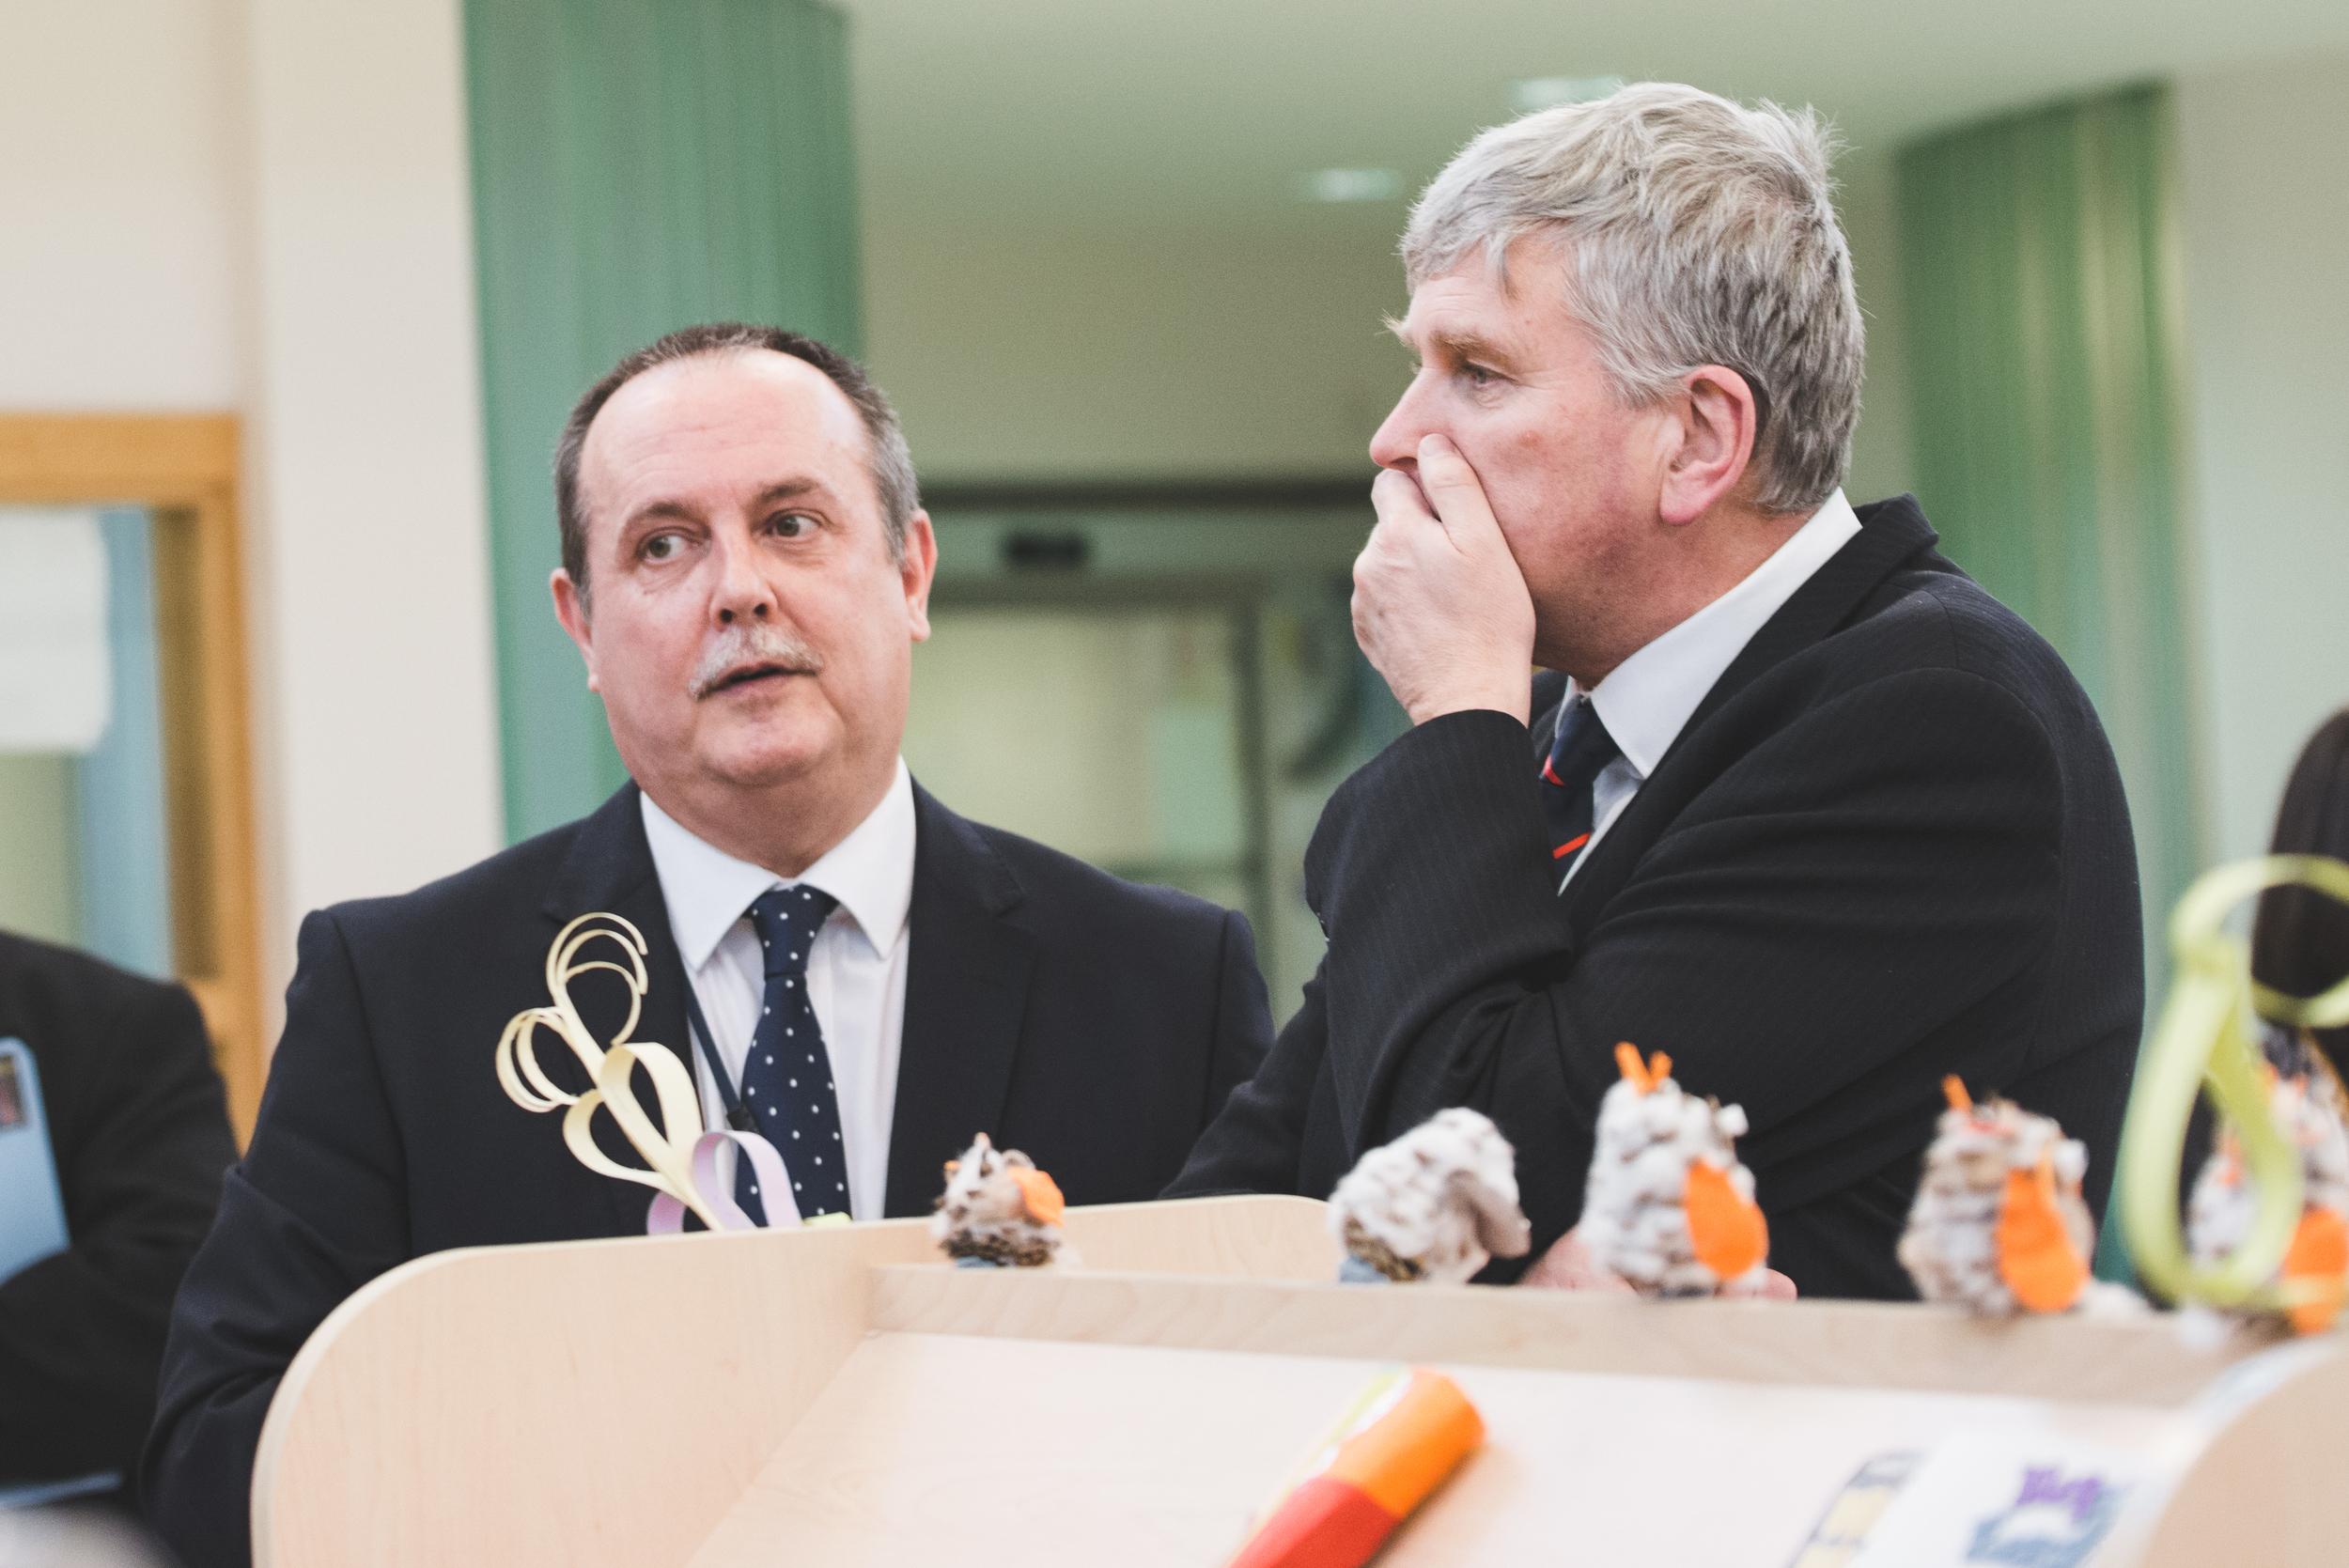 Raphael Kearns of the Lisburn Assessment & Resource Centre andHealth Minister Jim Wells